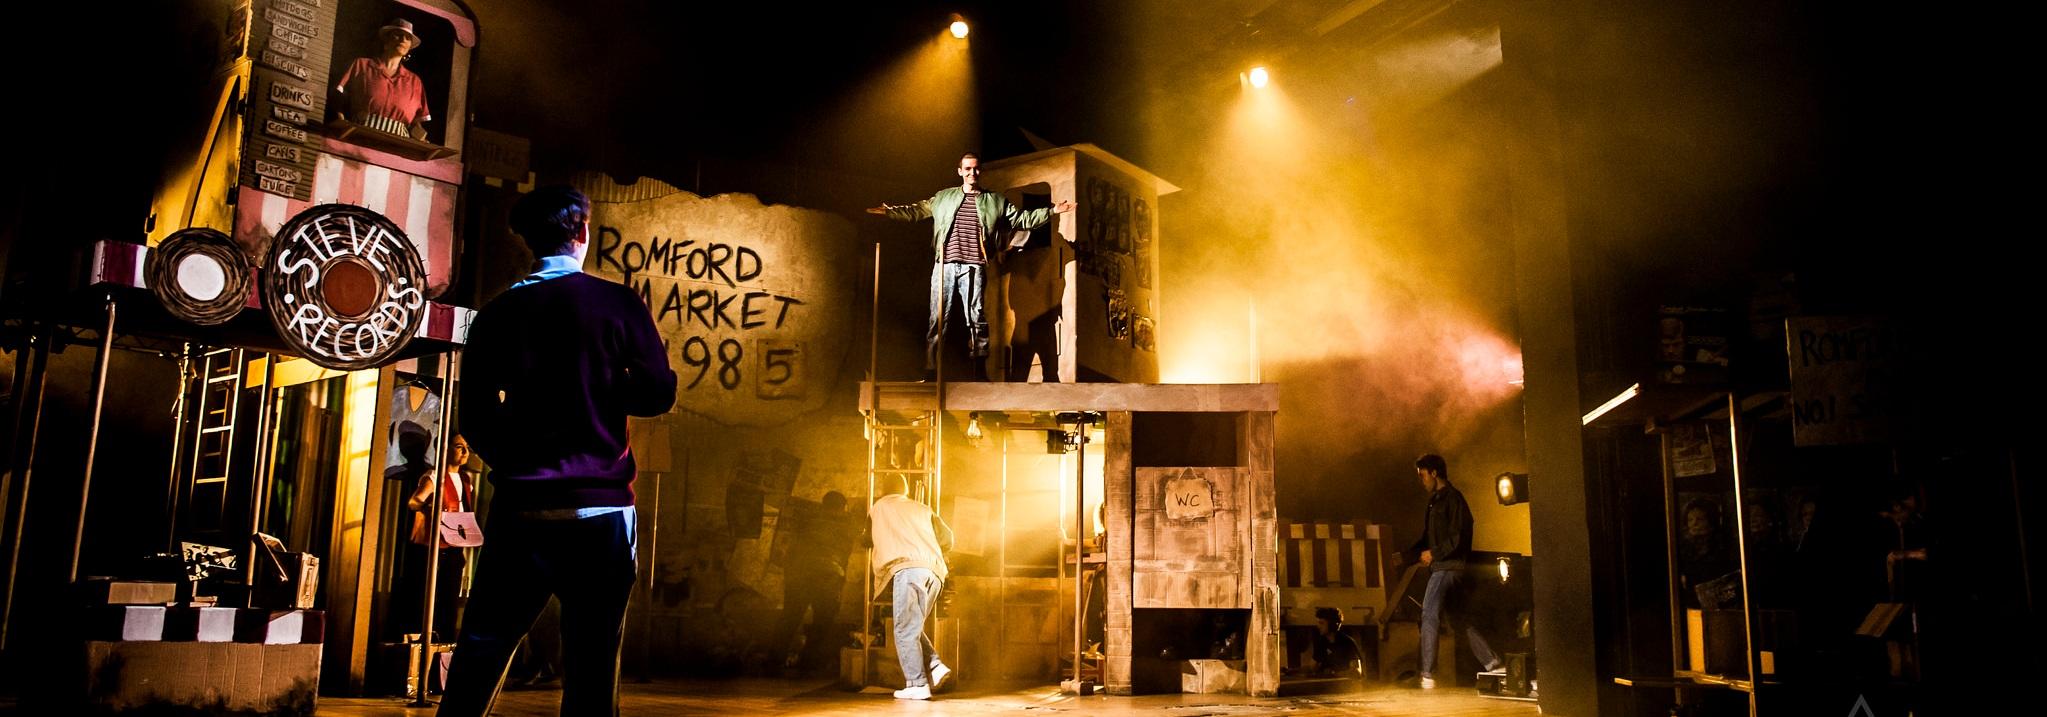 Market Boy - Embassy Theatre // Photo Credit: Zak Macro